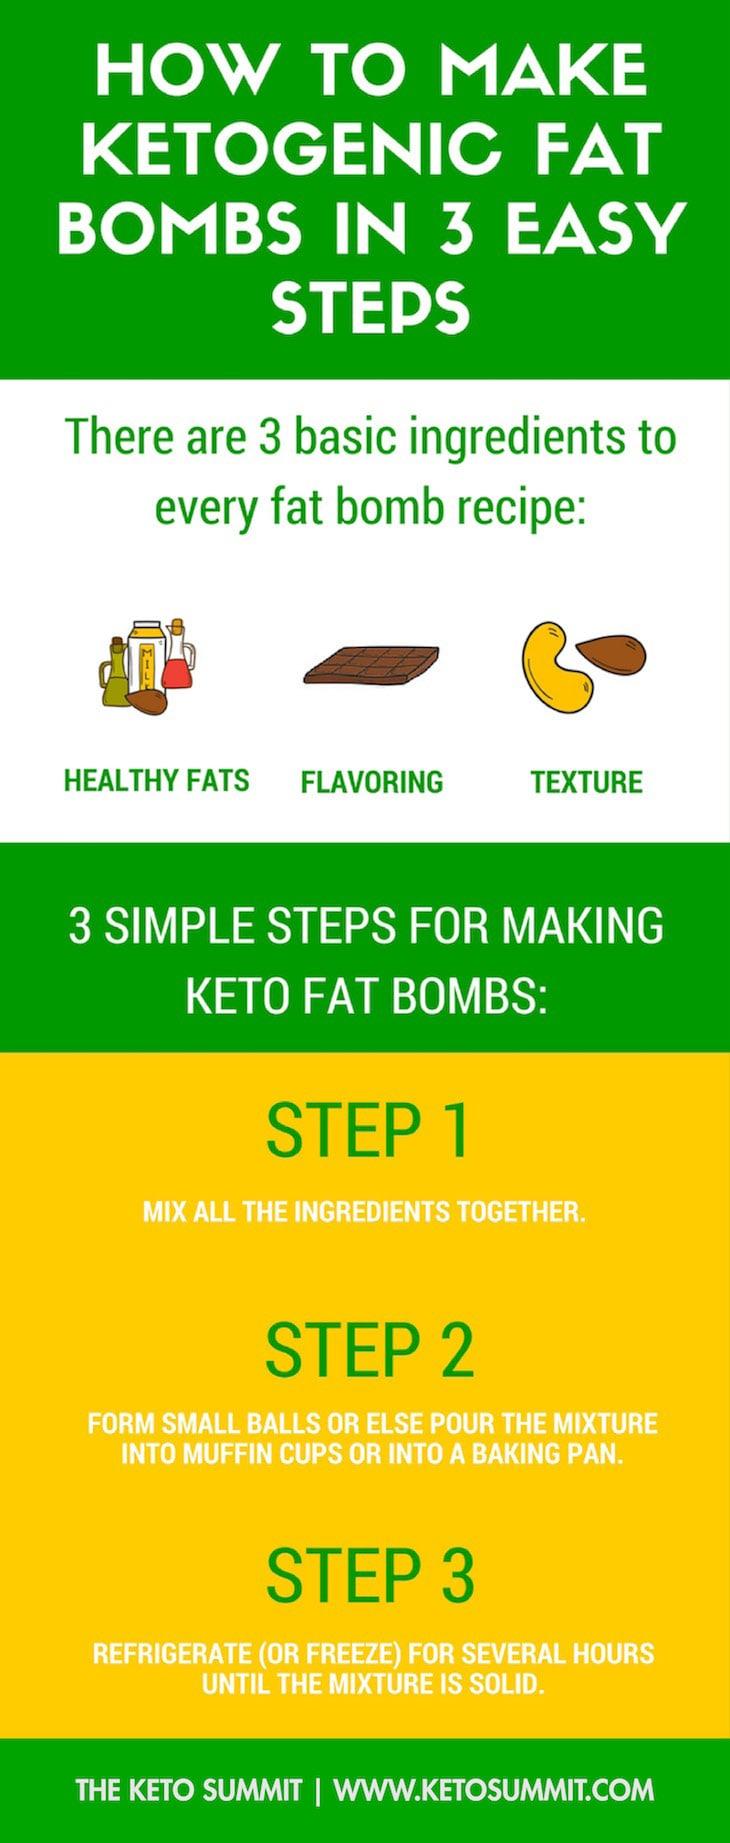 Keto Coconut Butter Pecan Fat Bomb Bites Recipe #keto https://ketosummit.com/keto-coconut-butter-pecan-fat-bomb-bites-recipe